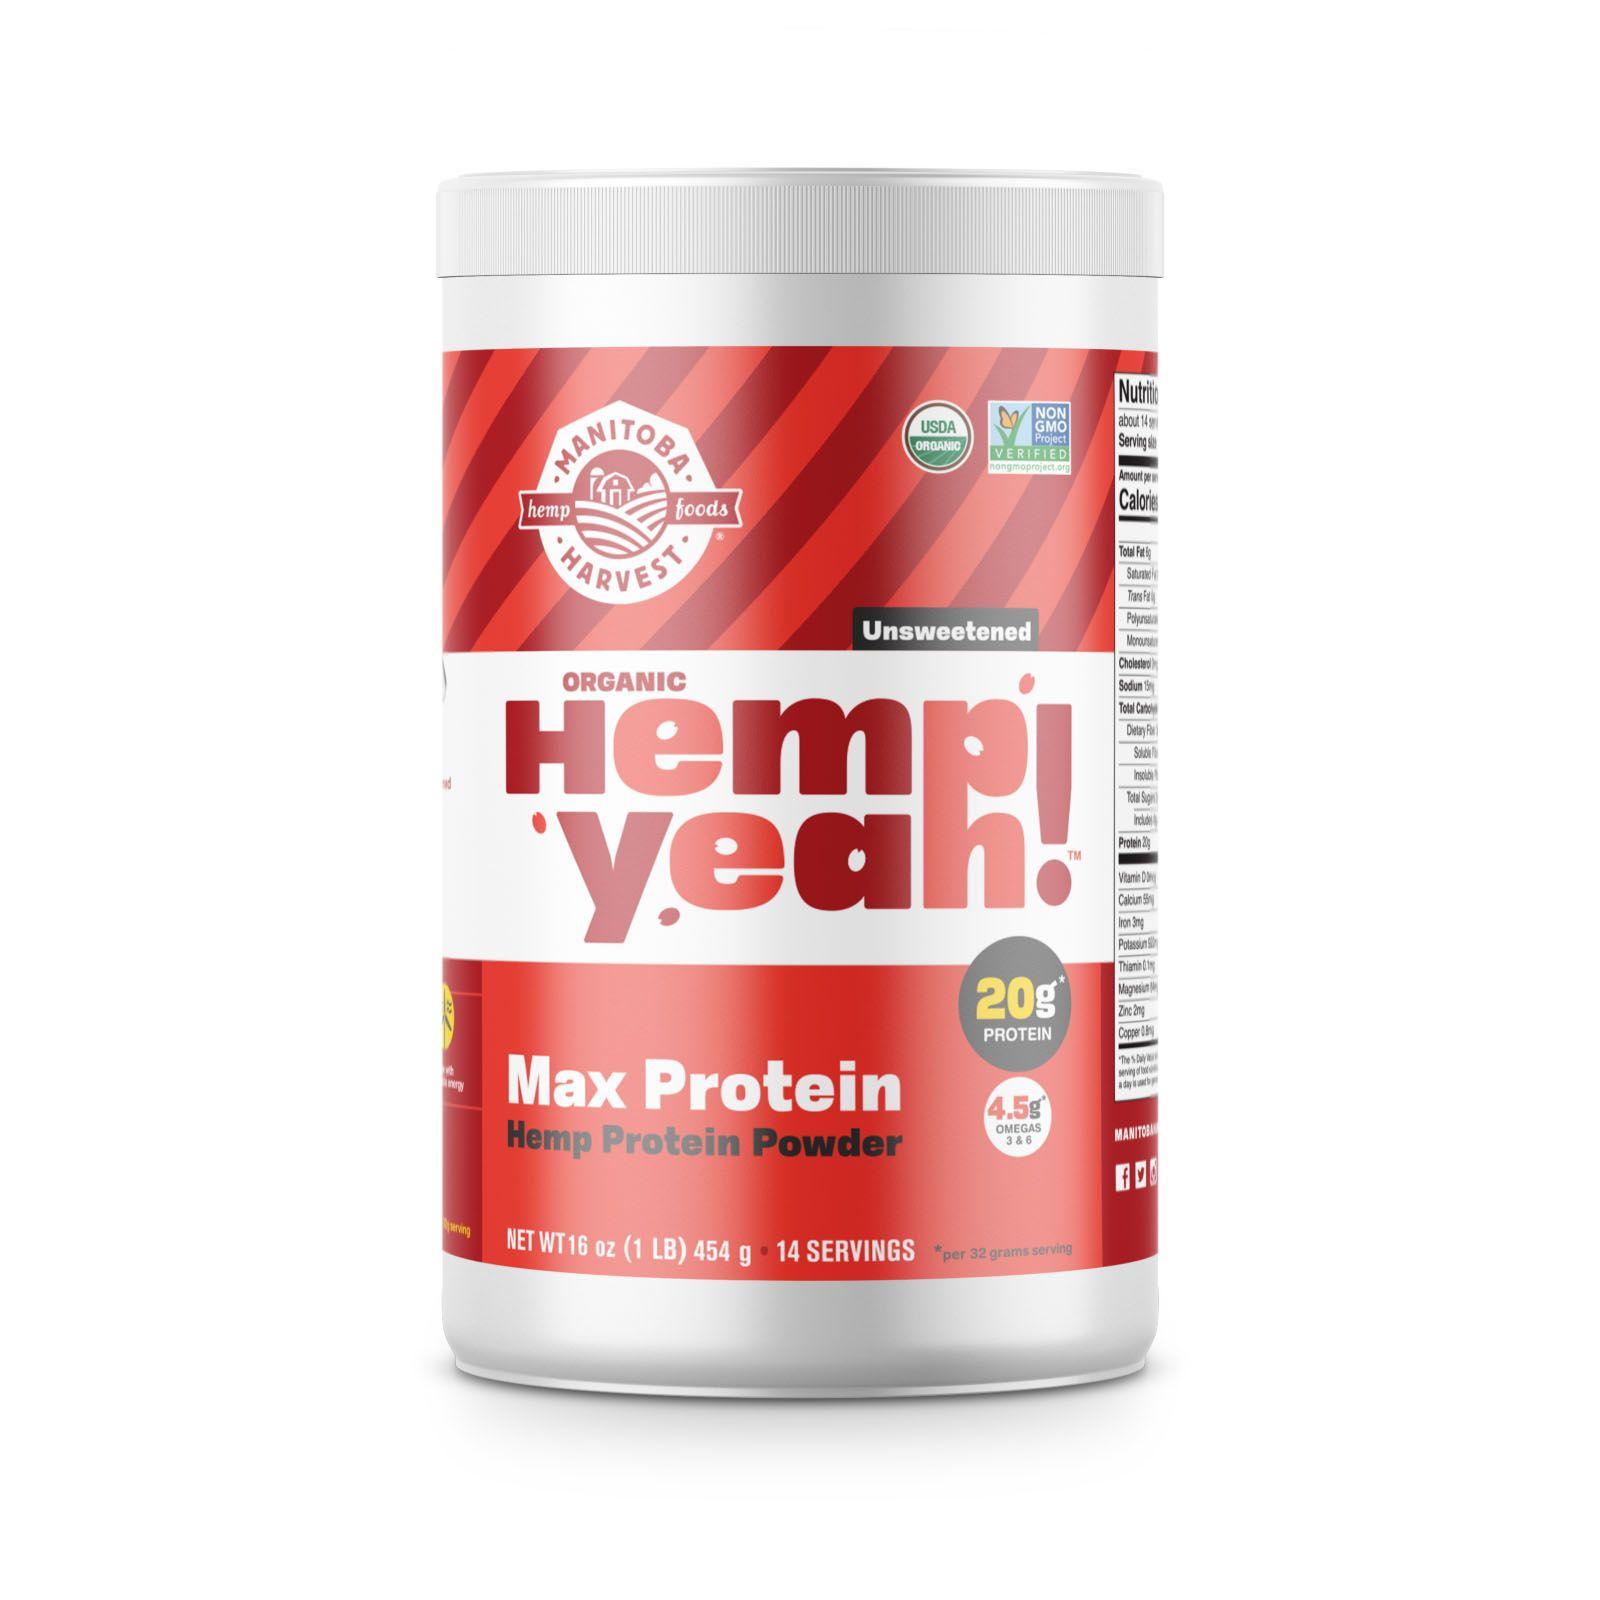 Hemp Yeah! Max Protein Powder Unsweetened 16 oz. (454 g)